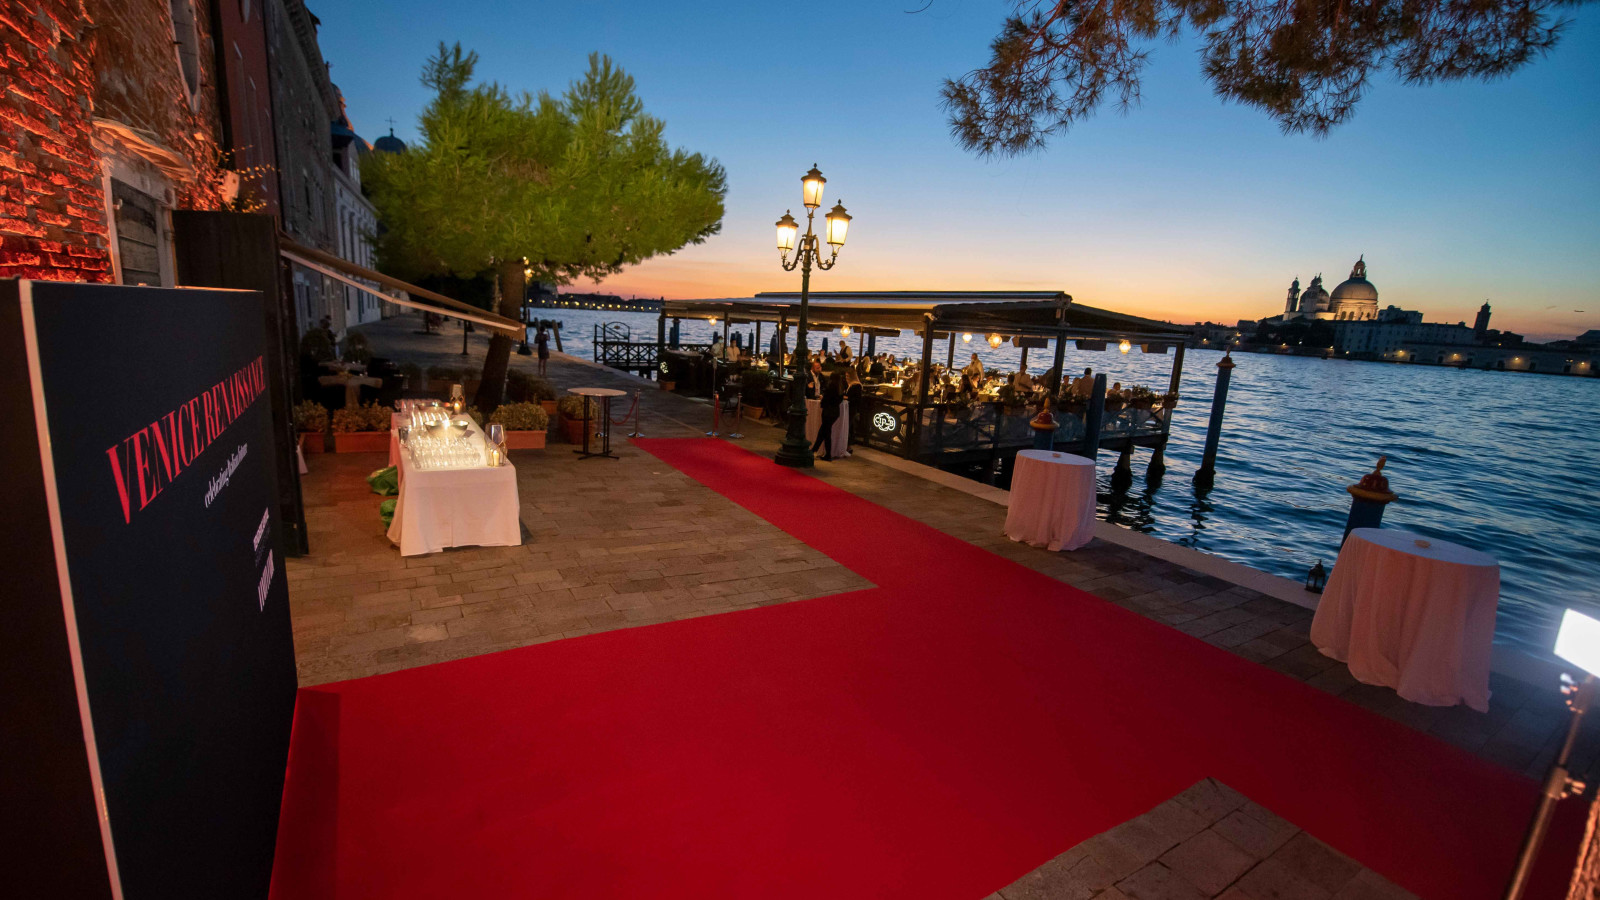 EVENT-ENTRANCE---Benedetta-Malavasi---Italy---Vanity-Fair-Venice-Film-Festival-small